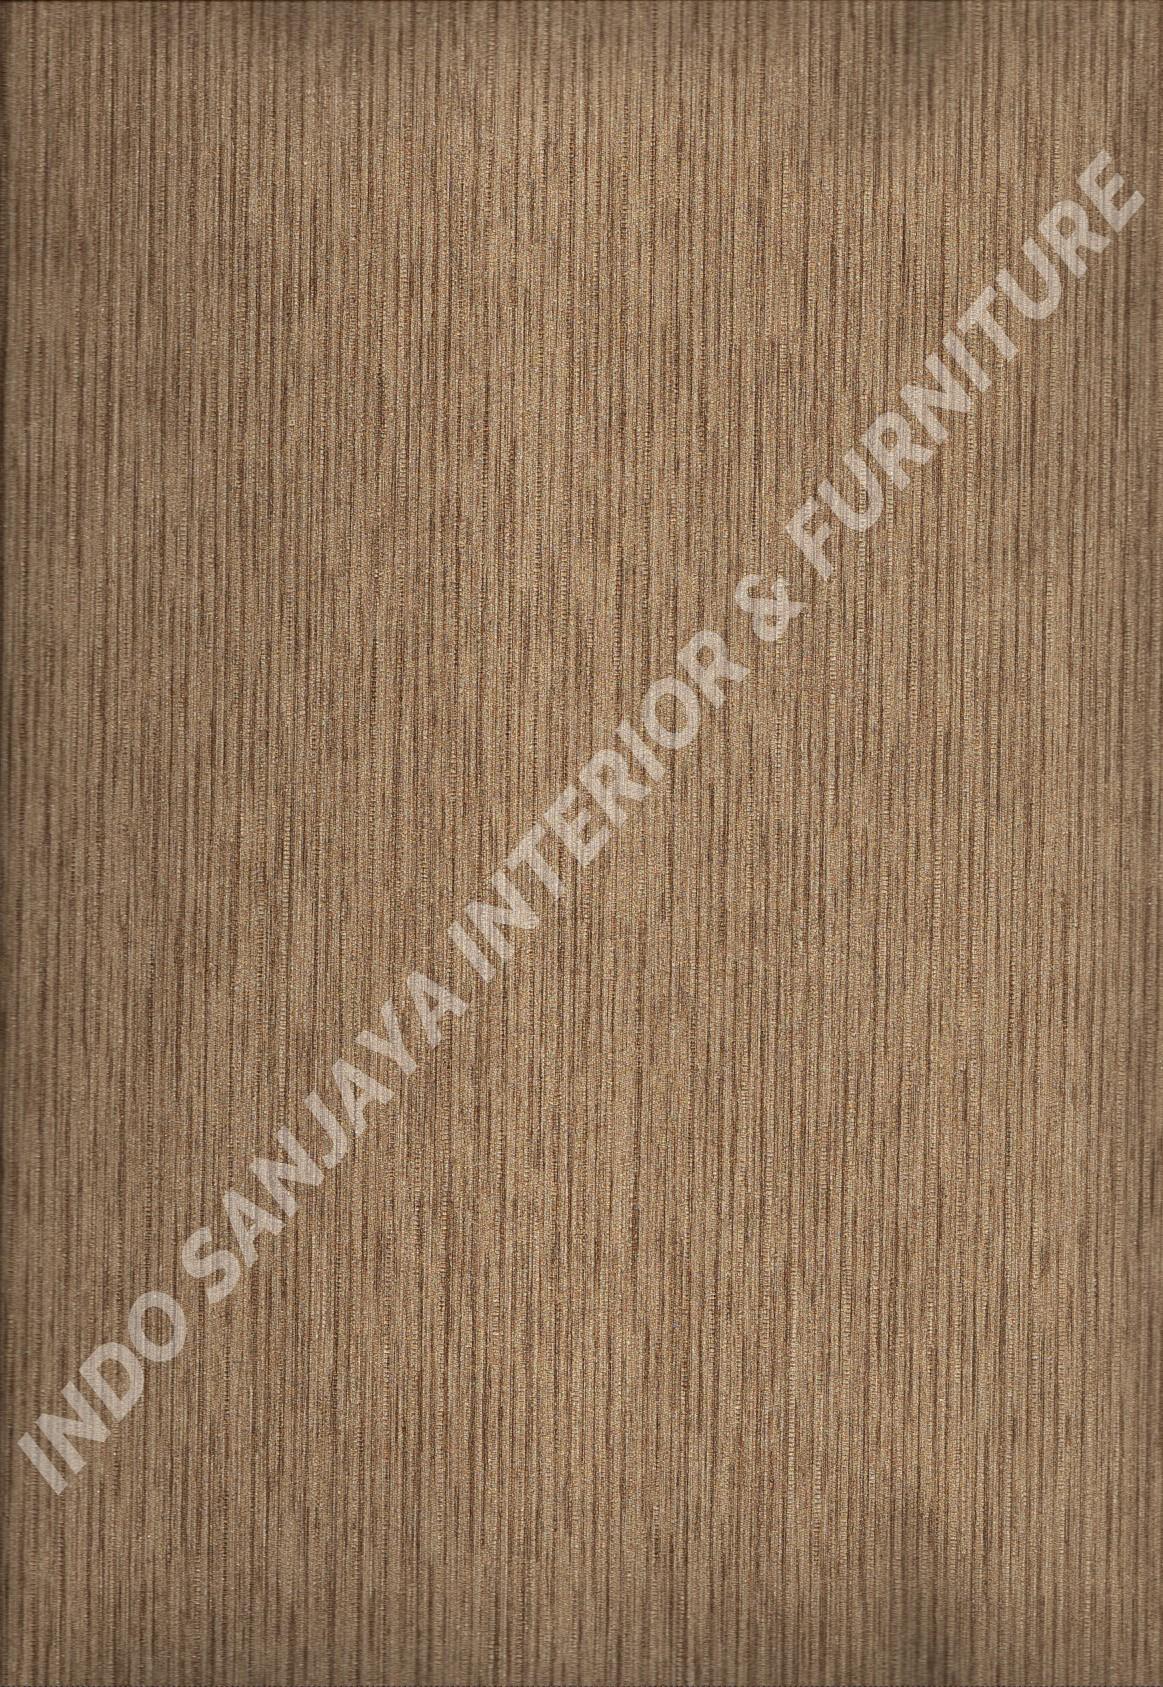 wallpaper   Wallpaper Minimalis Polos 87084:87084 corak  warna